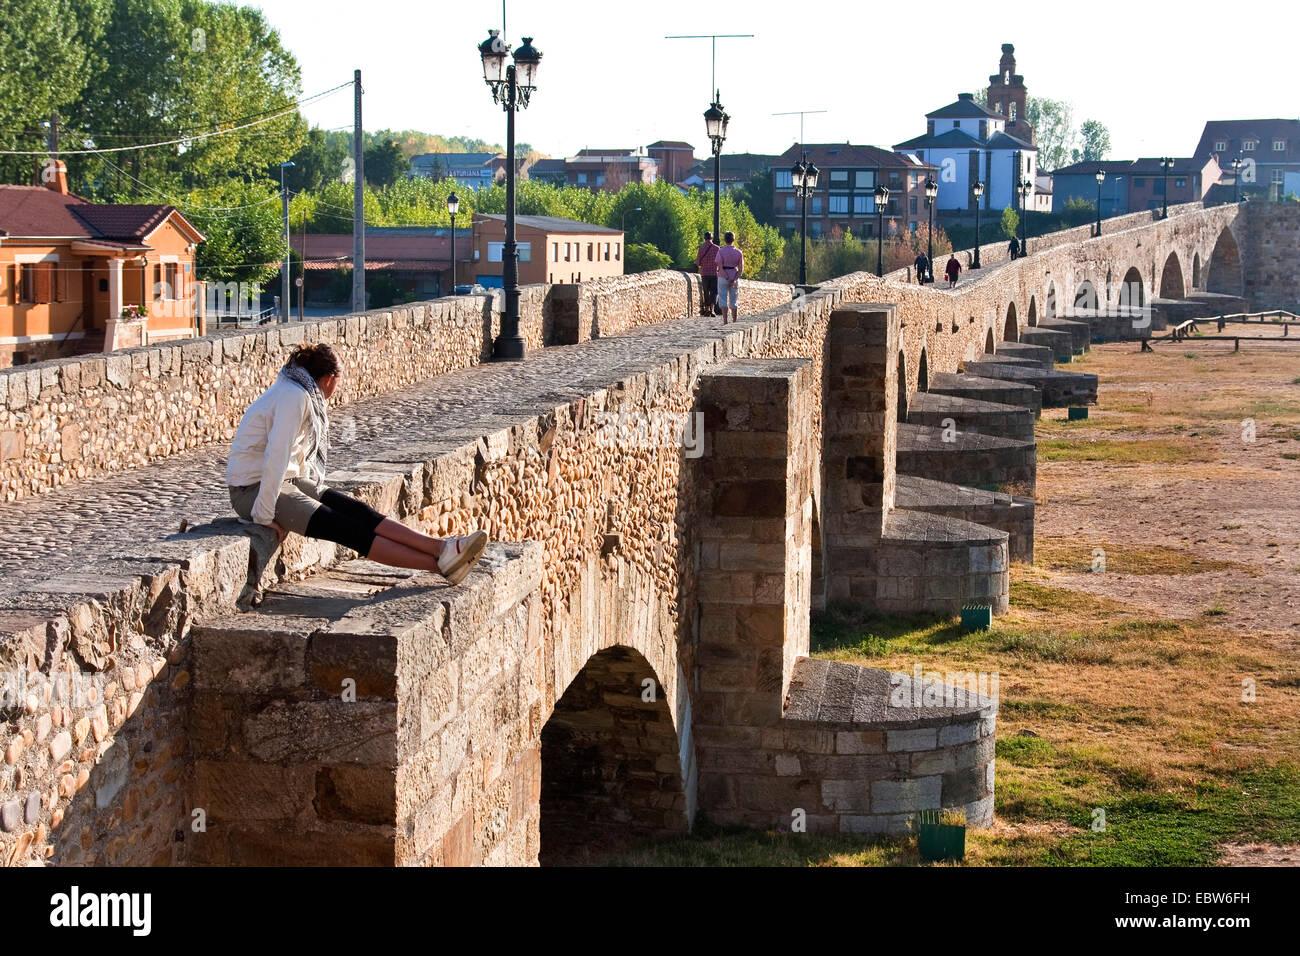 mediaeval bridge 'Puente de �rbigo' in the morning sun, Spain, Kastilien und Le�n, Hospital de �rbigo - Stock Image